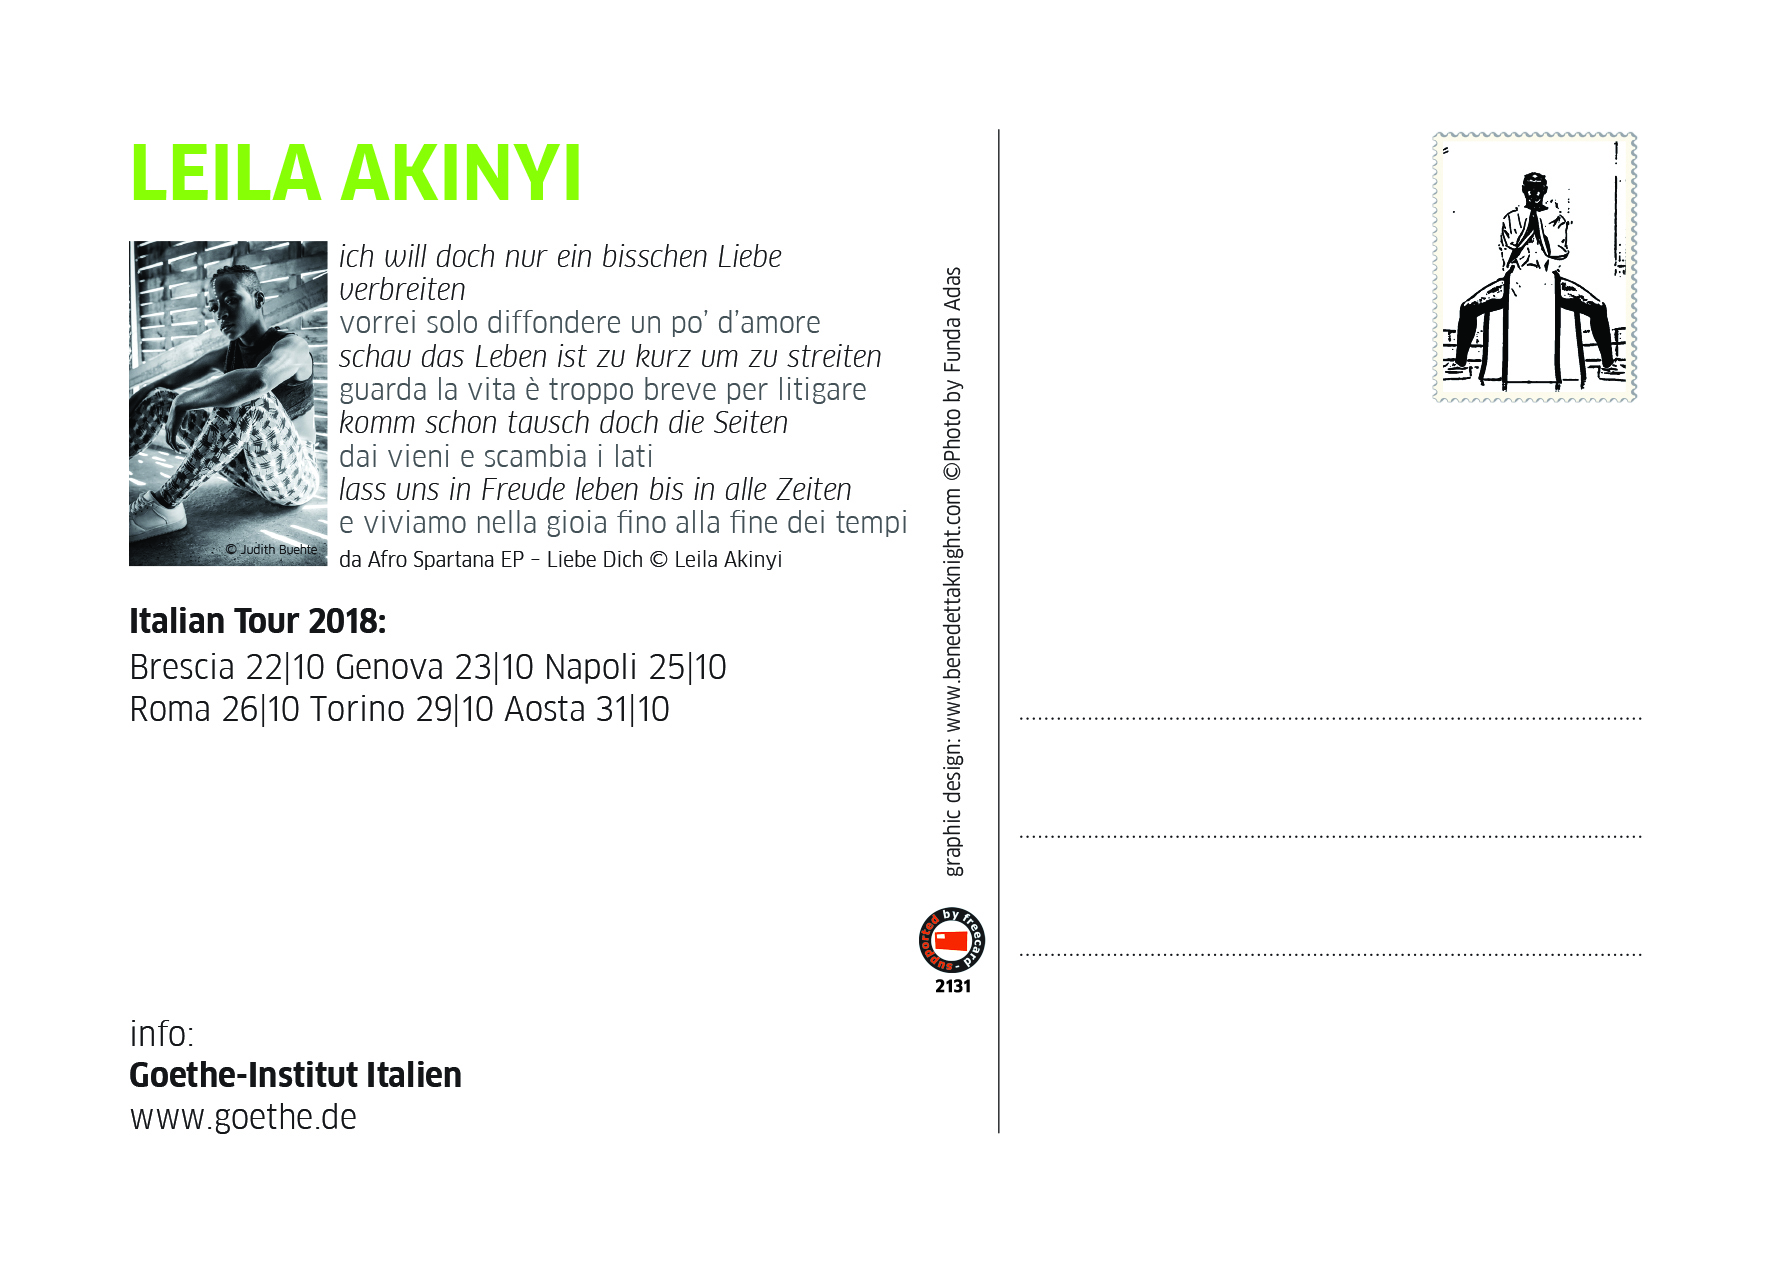 Freecards: Leila Akinyi - Goethe-Institut